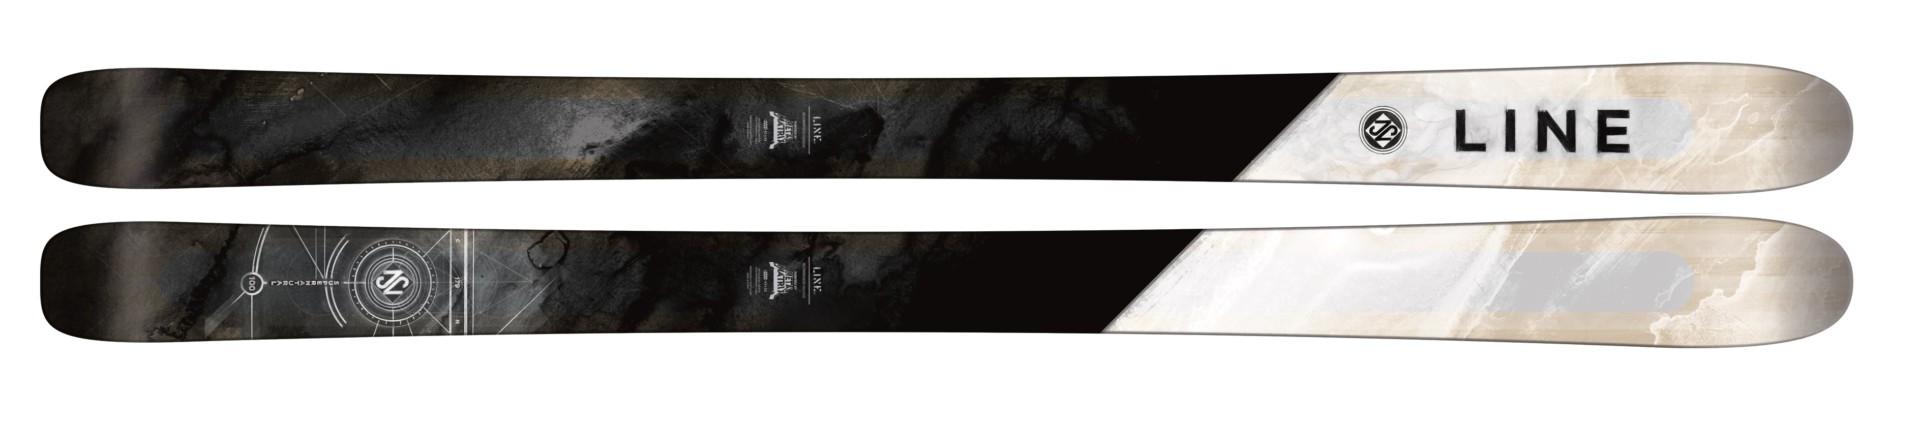 Ski Reviews Archive - Realskiers